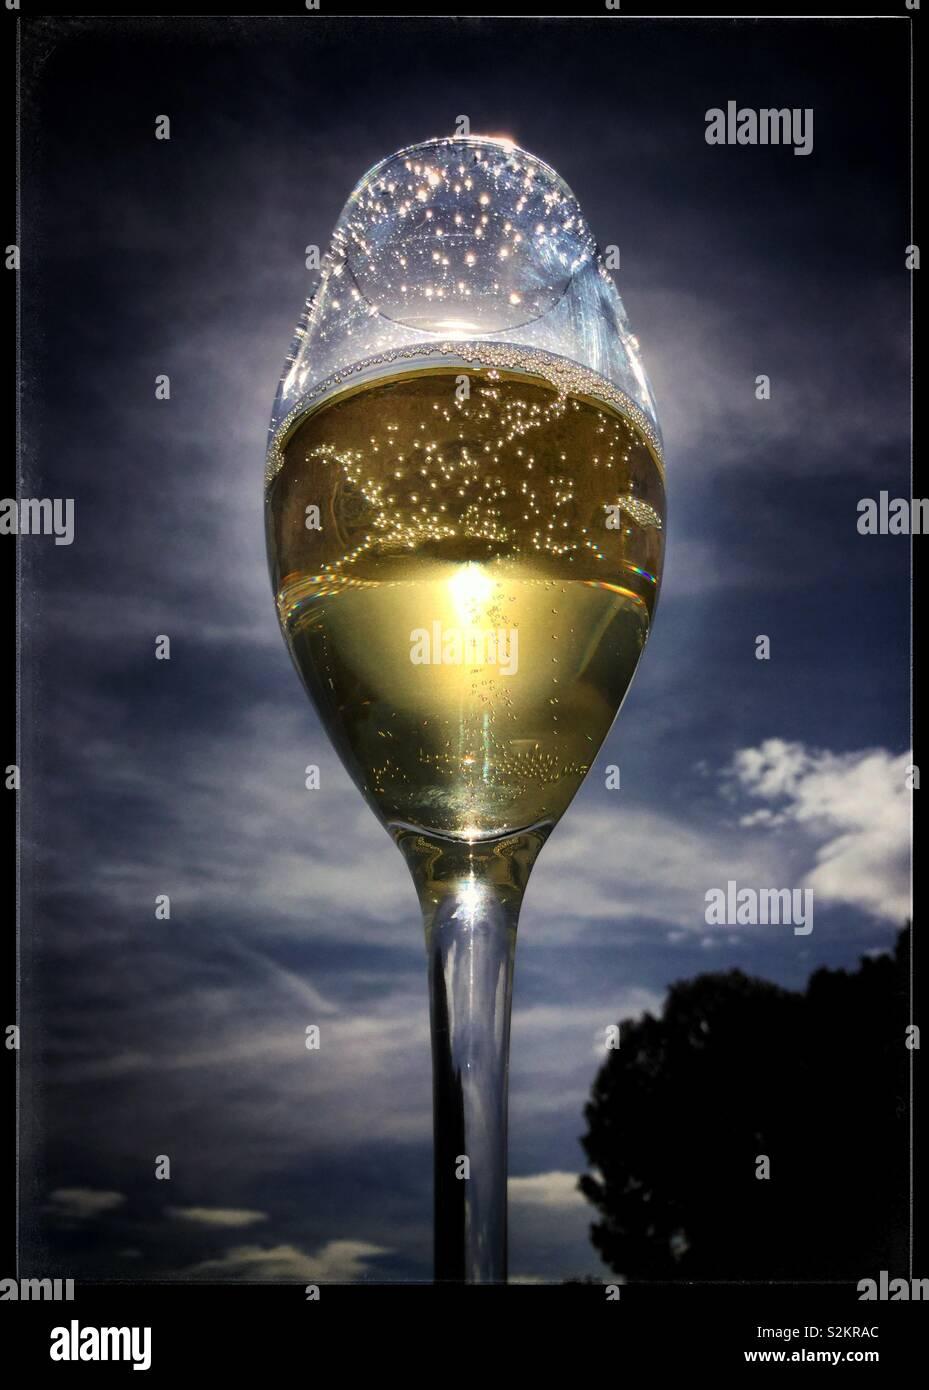 Ein Glas Sekt, Katalonien, Spanien. Stockbild